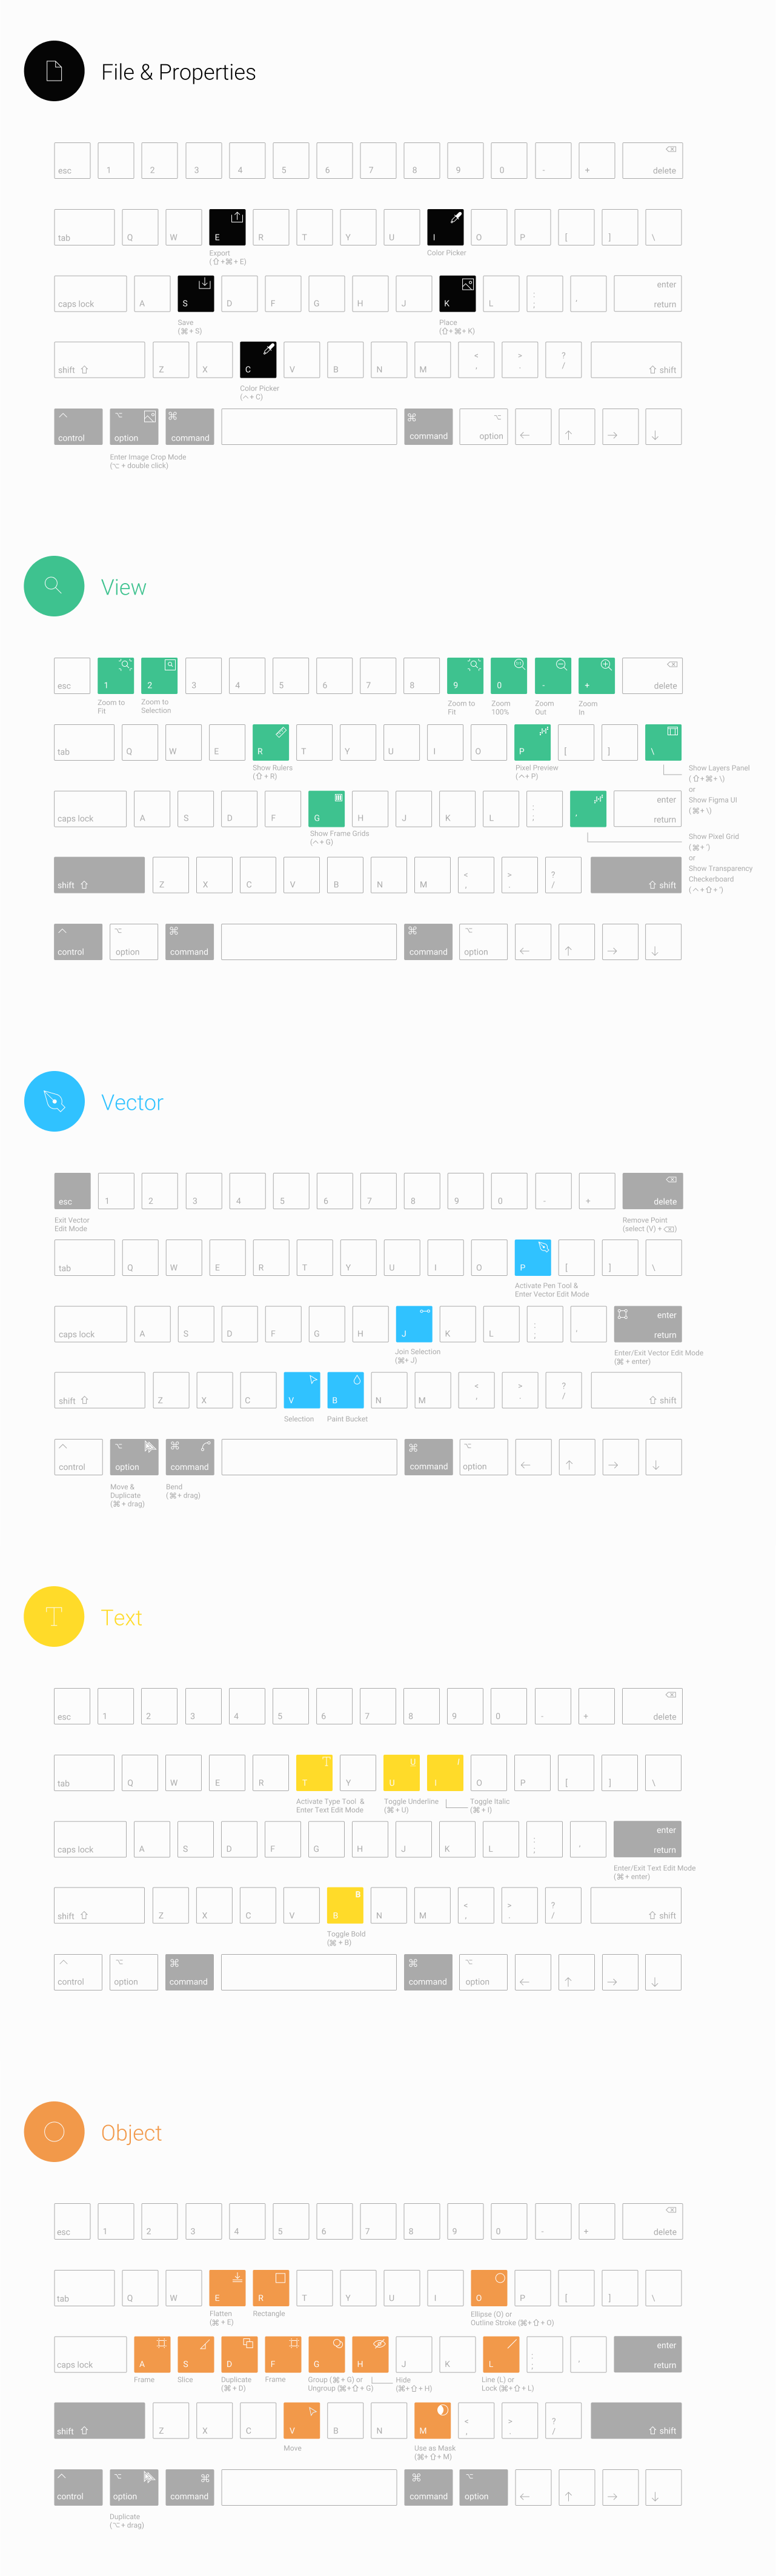 Figma Keyboard Shortcuts for UI Designers